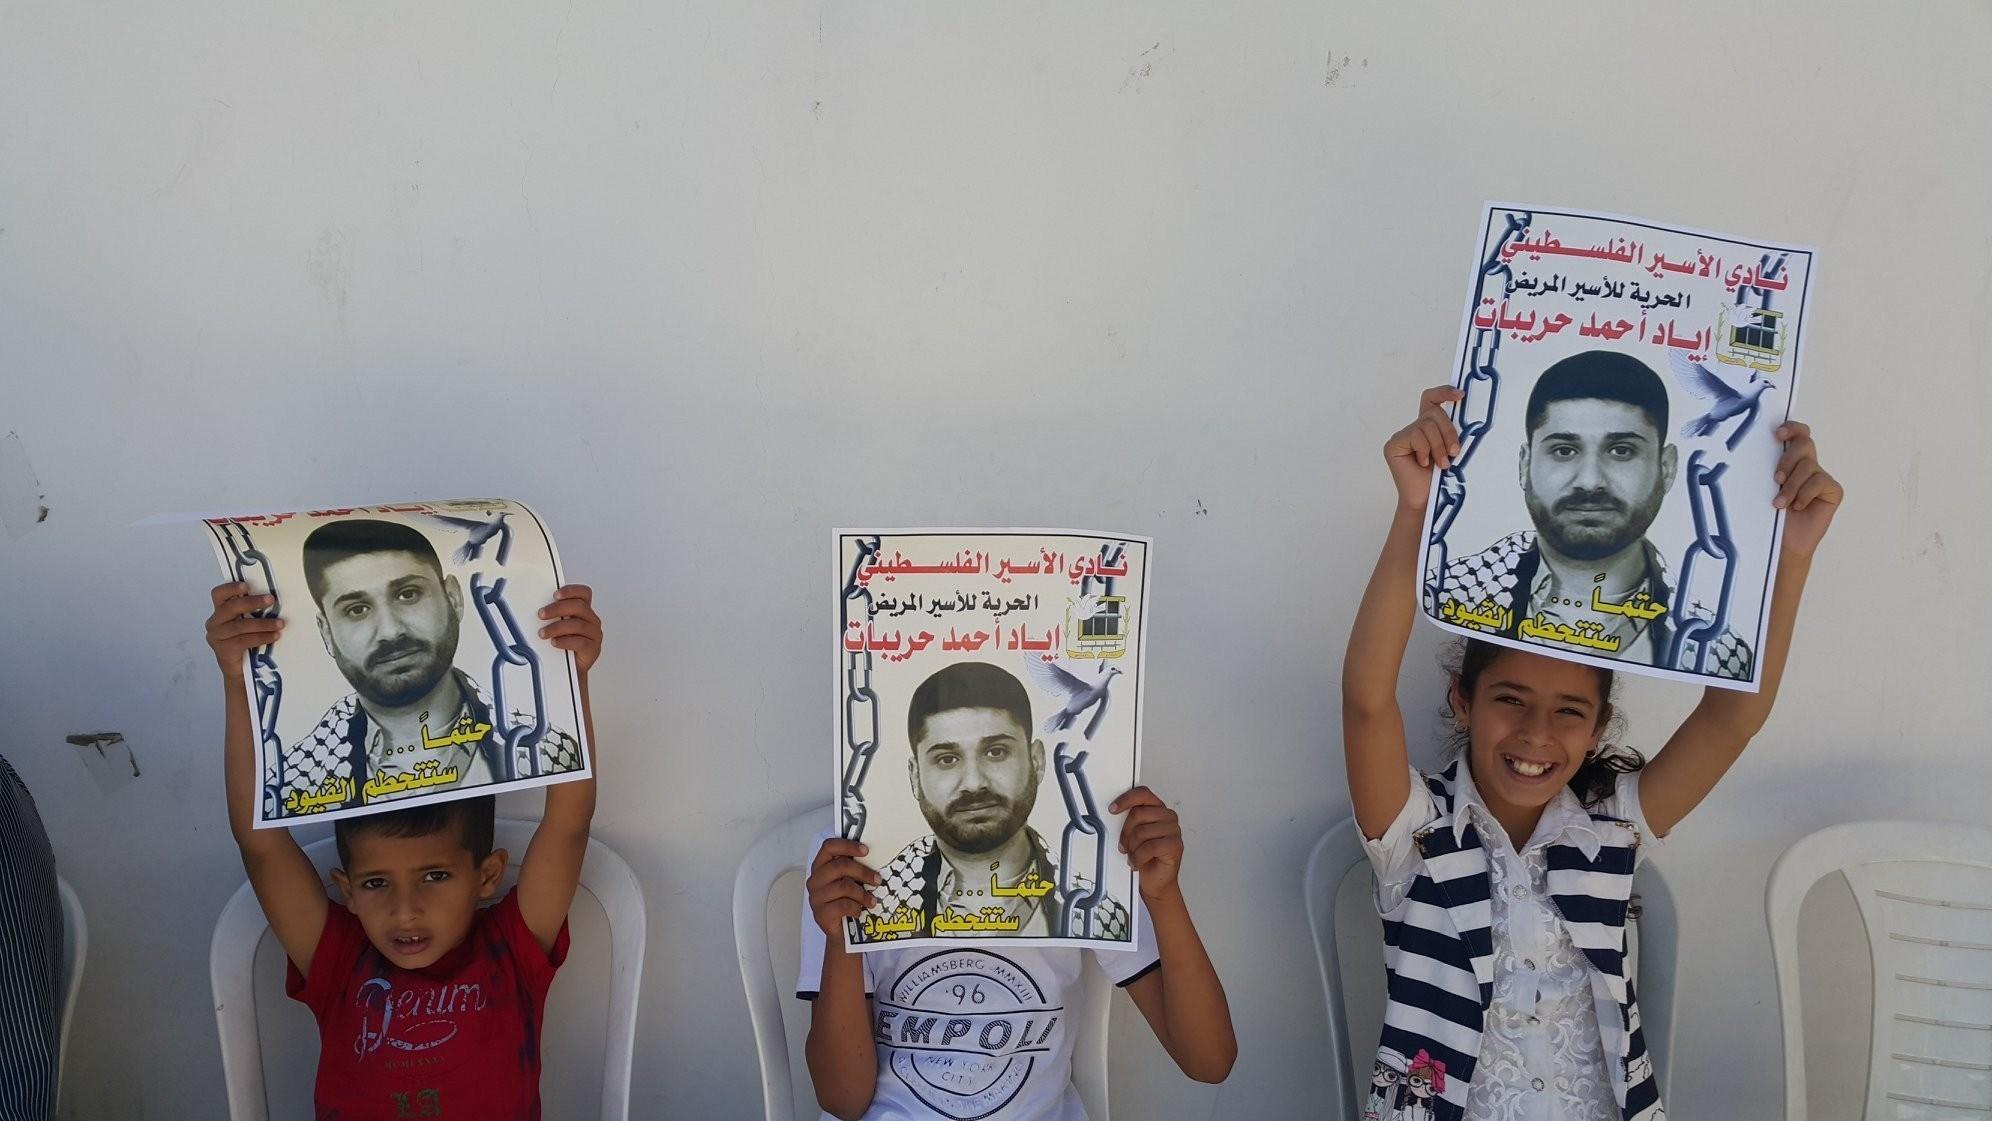 Palestinian Prisoner Iyad Harbiyat's Condition Deteriorates